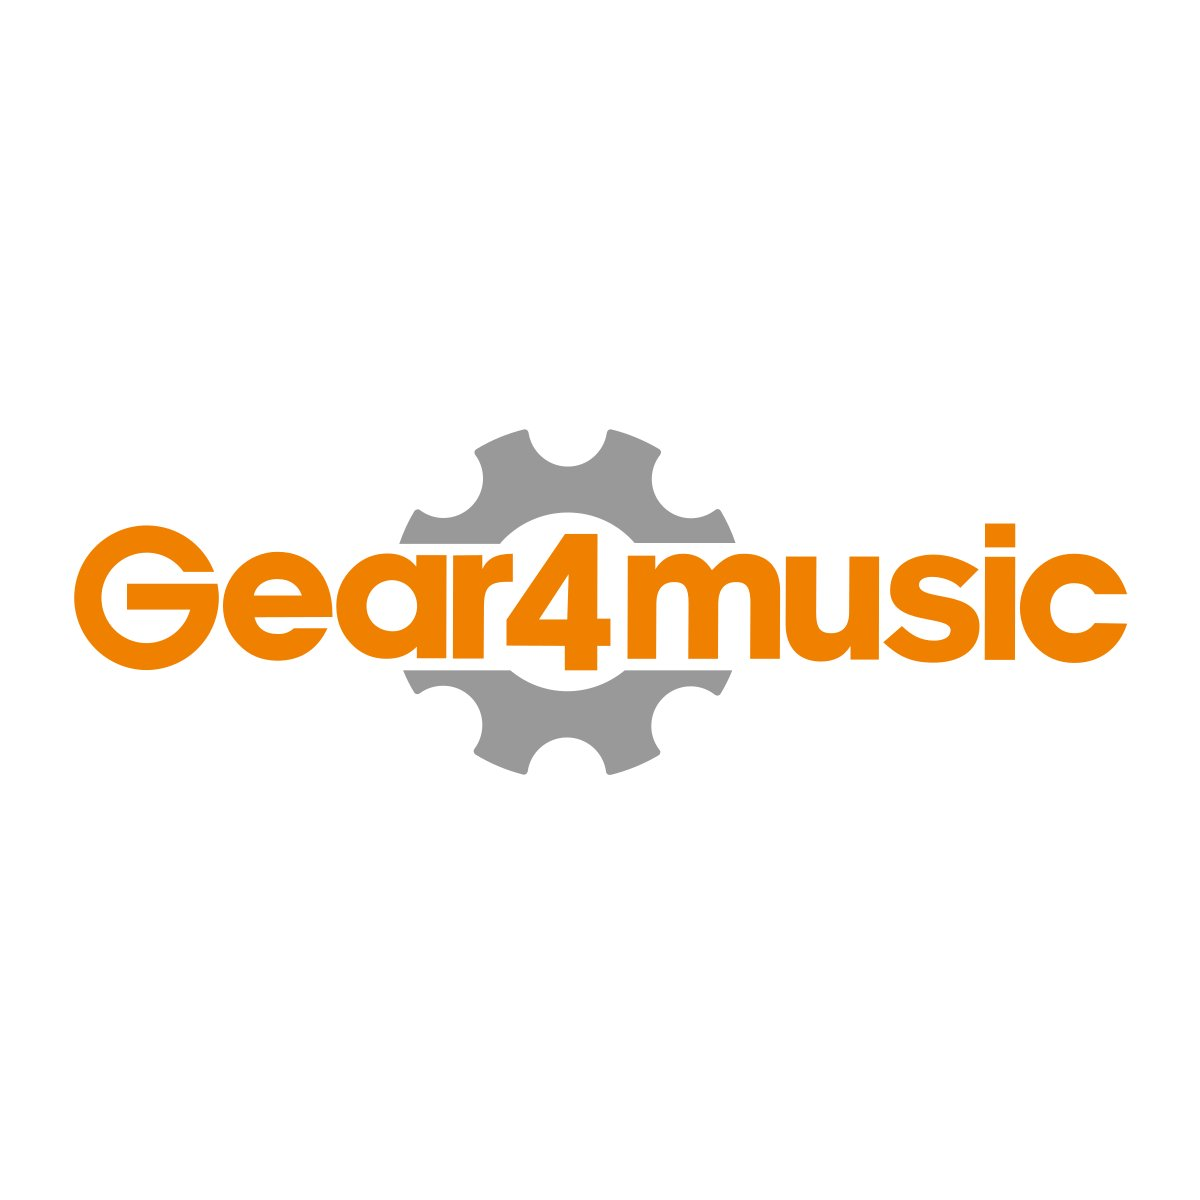 MK-3000 Key-Lighting Keyboard by Gear4music - Complete Pack